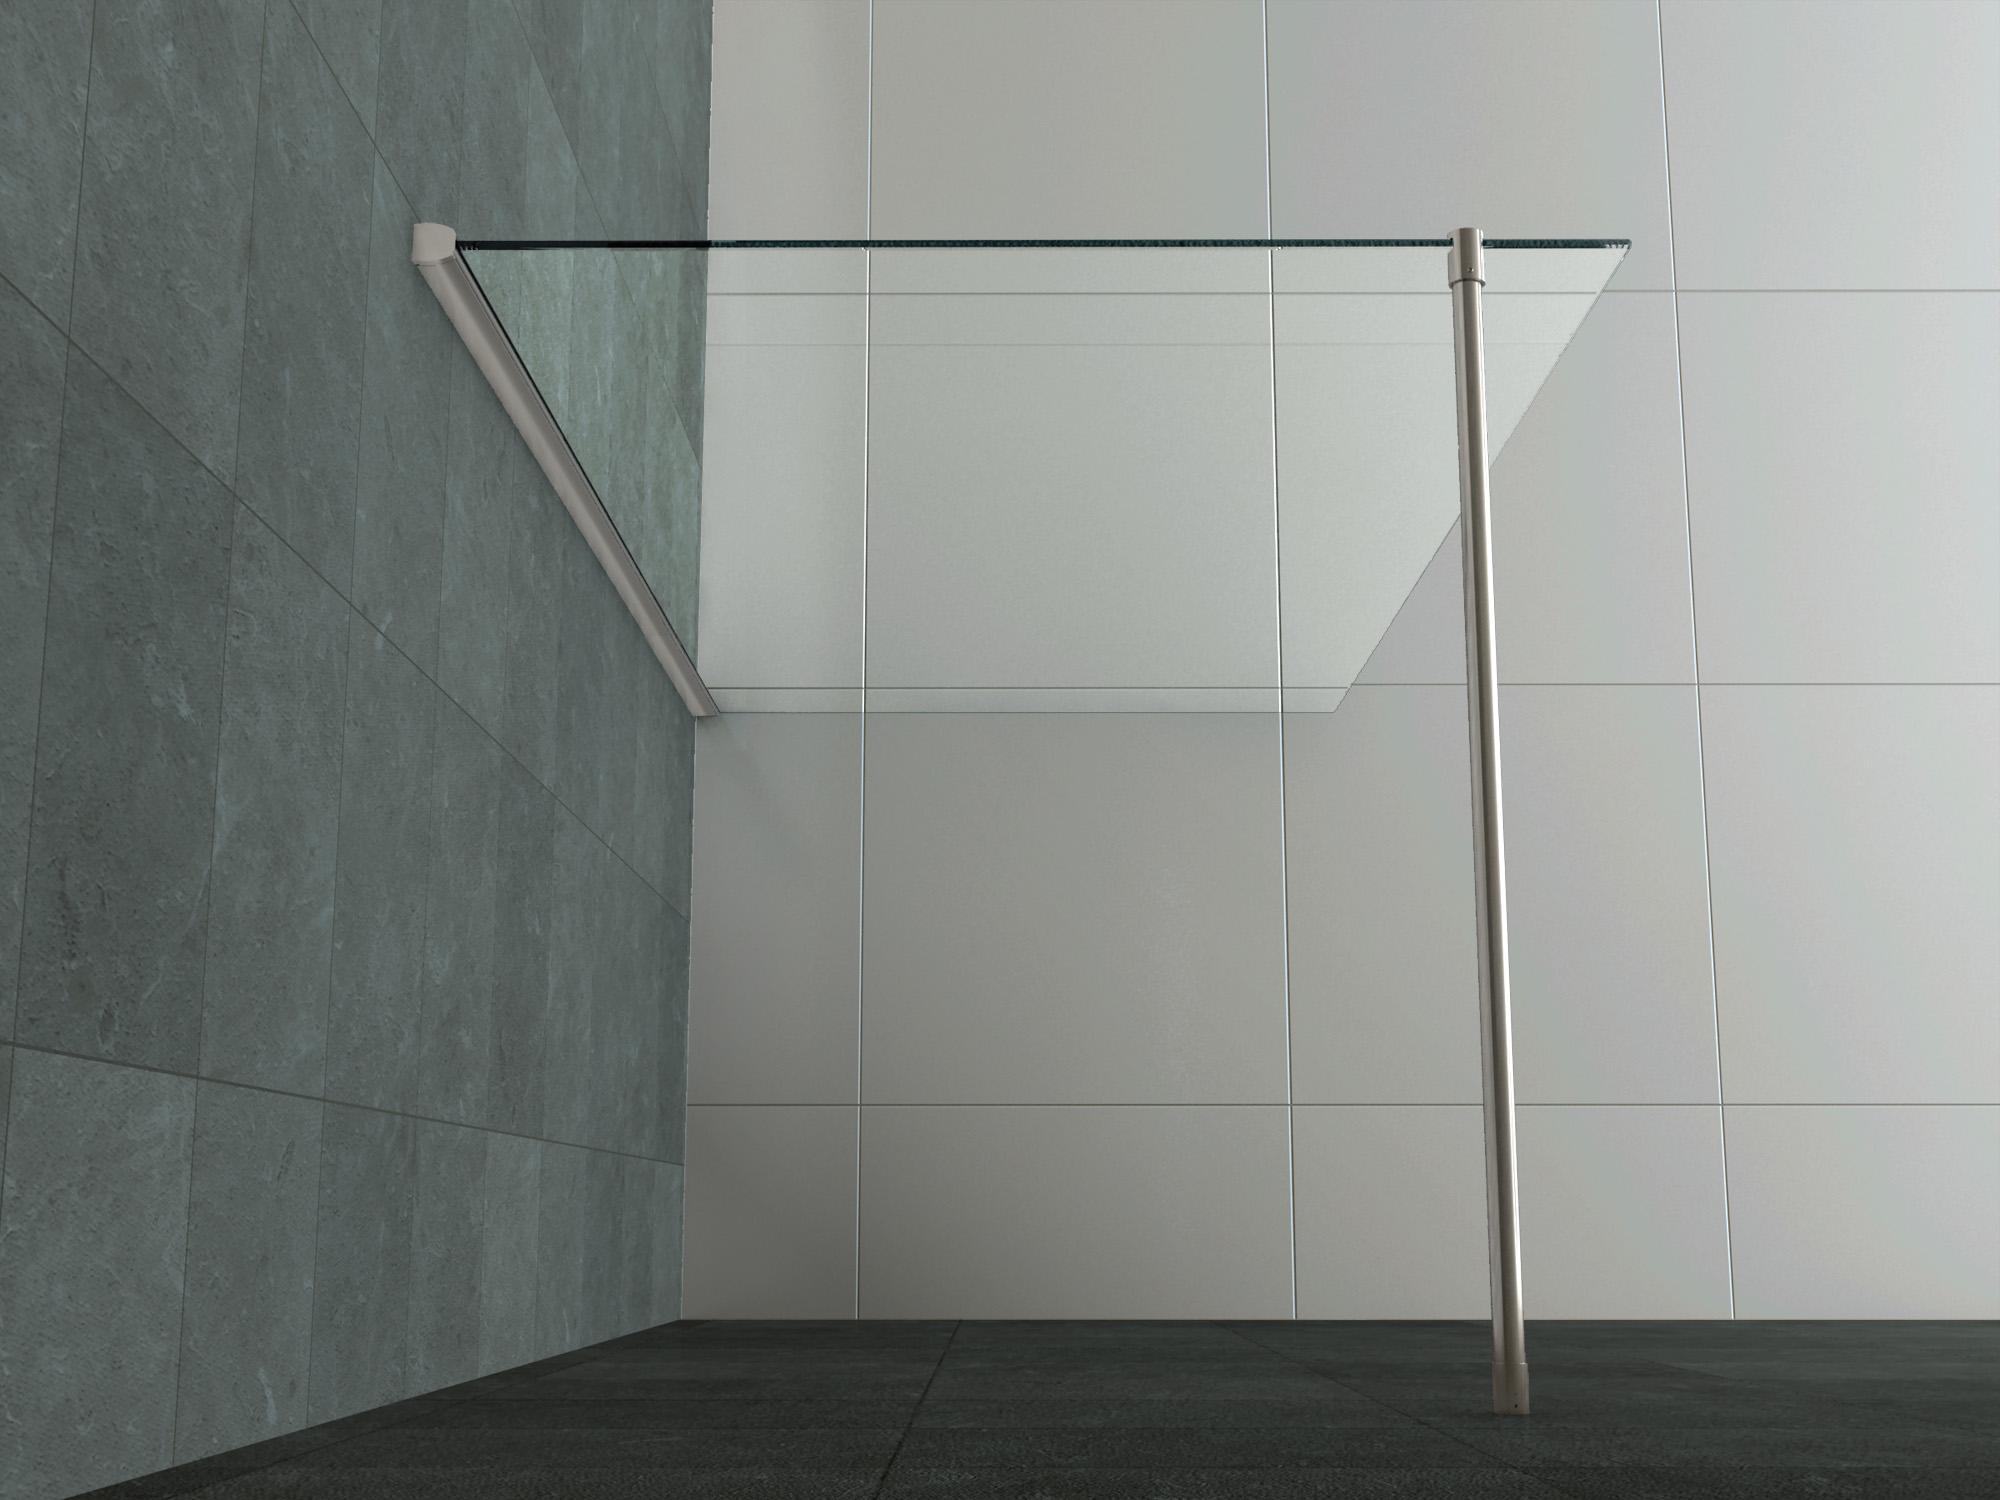 Duschtrennwand  100 - 140 x 200 Glas Duschwand Duschkabine Duschabtrennung Dusche ...